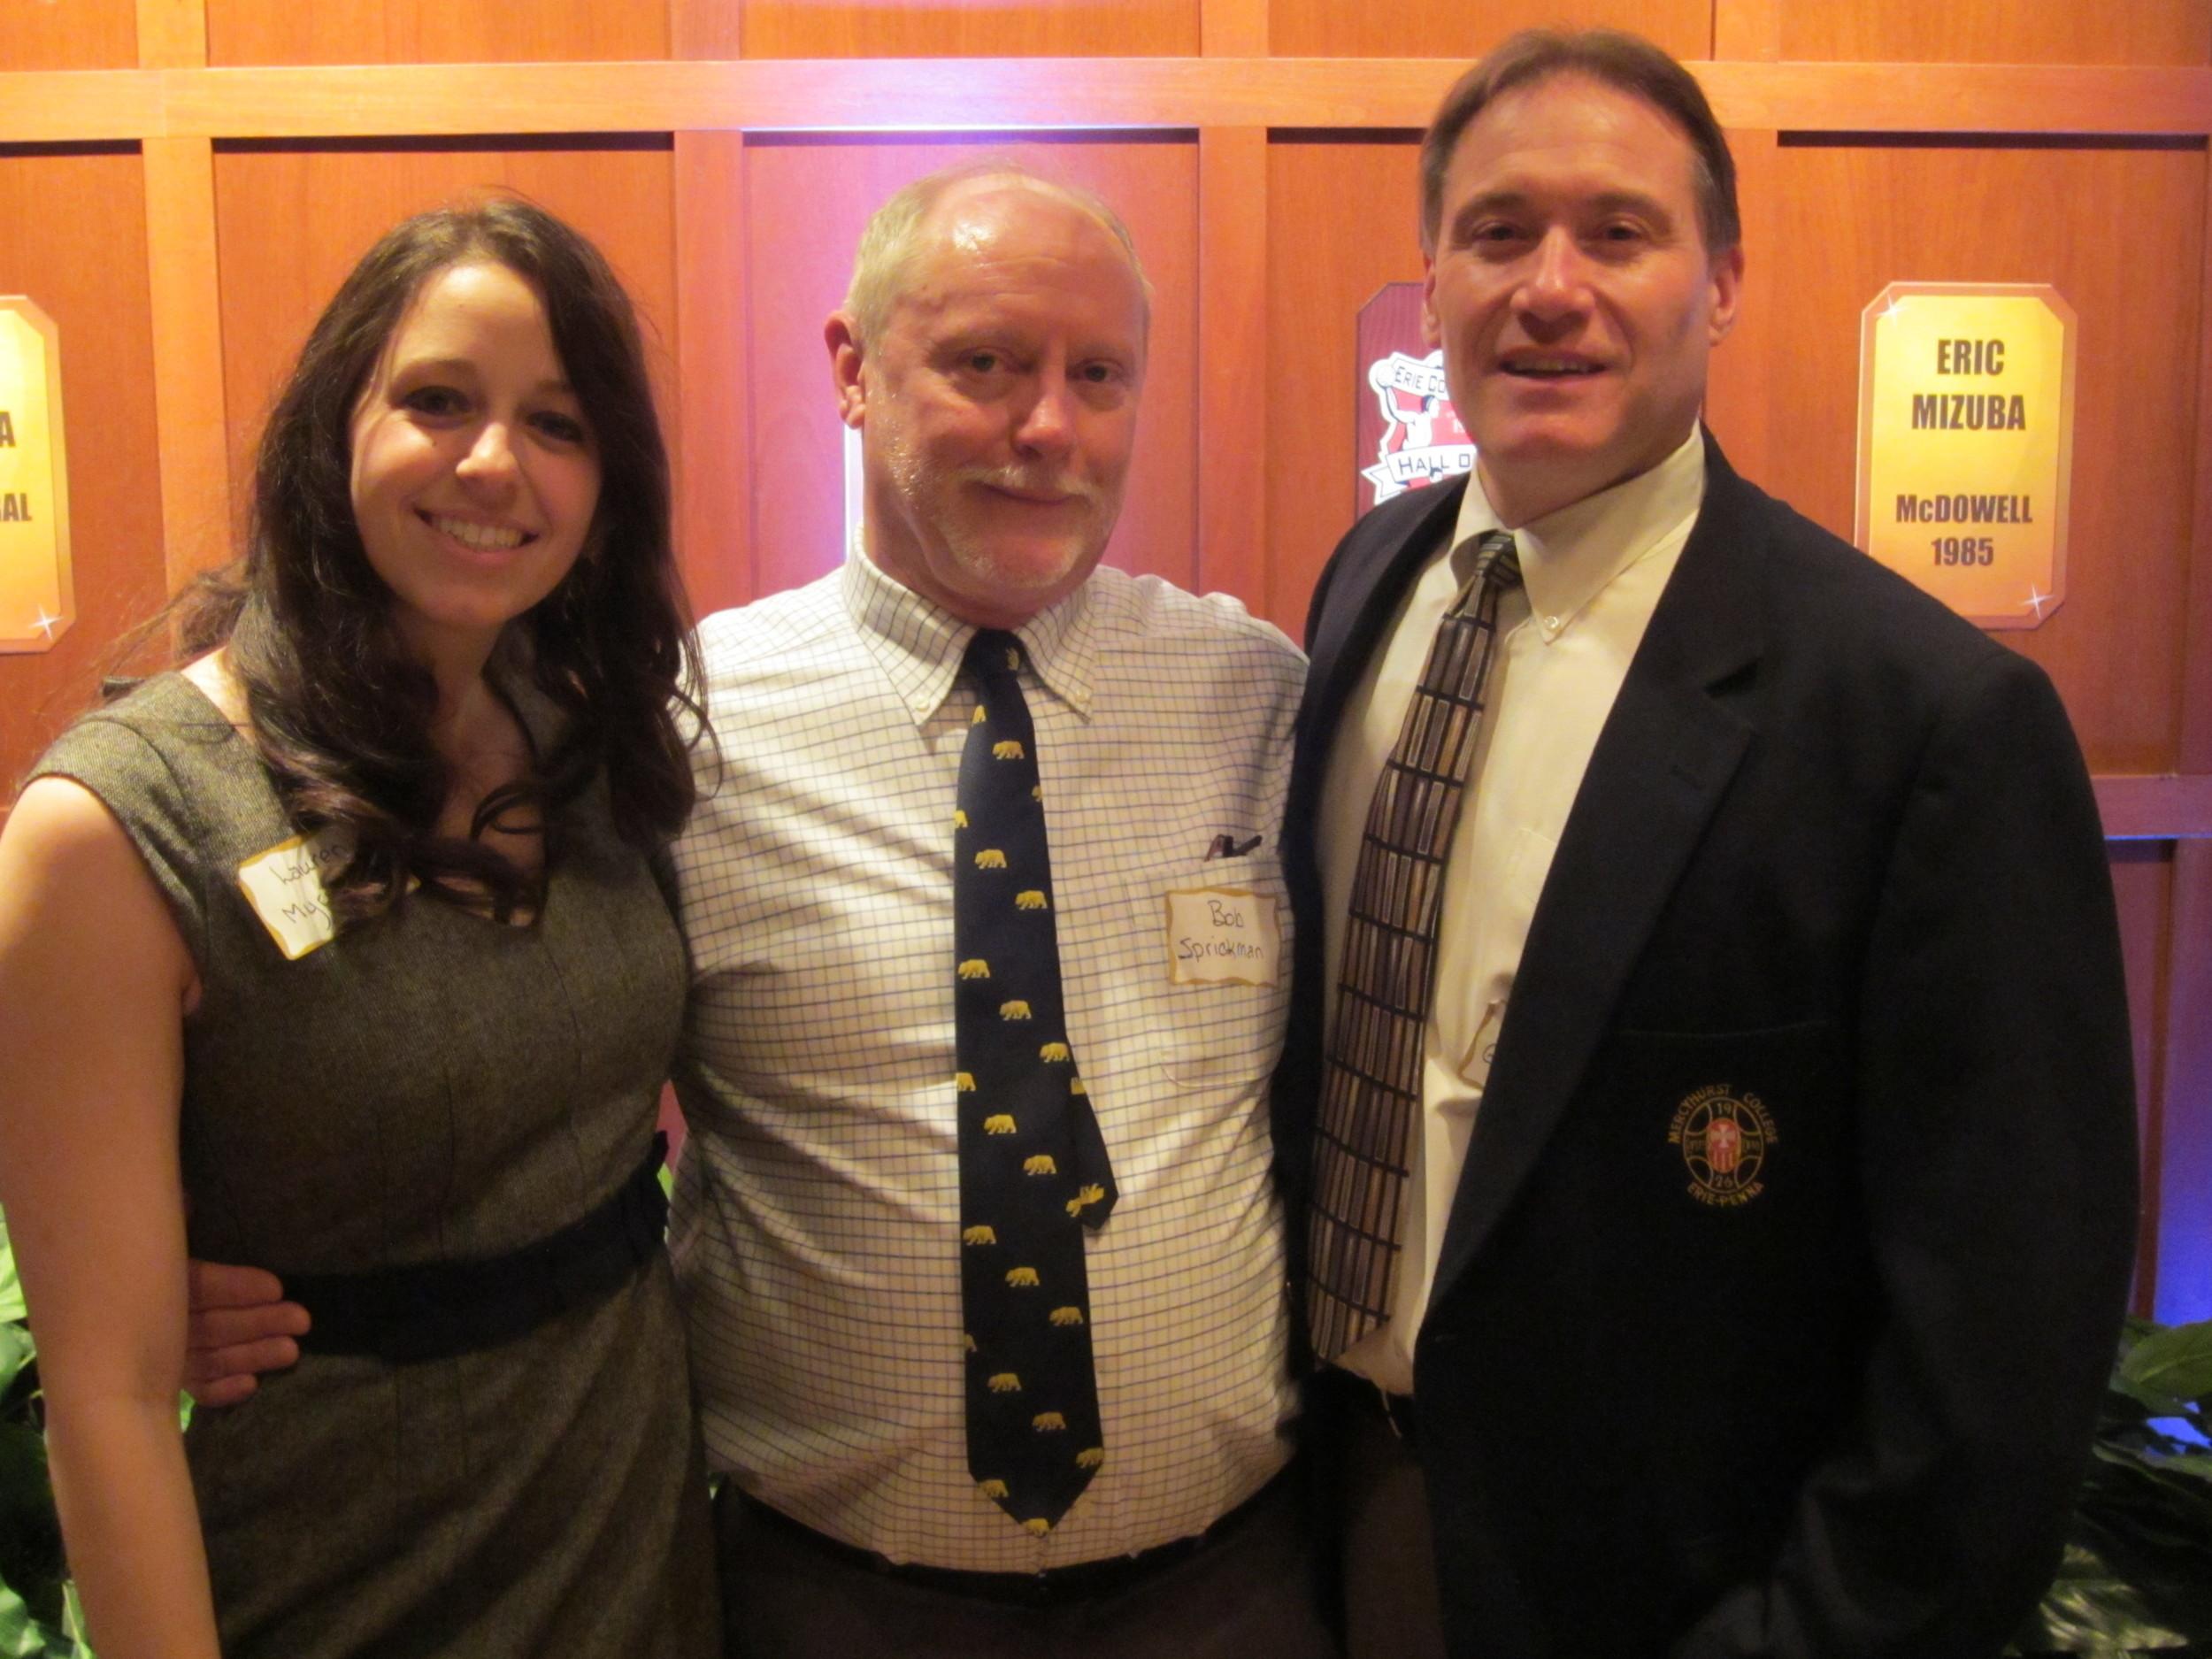 Lauren Myrick, Bob Sprickman and Daryl Georger